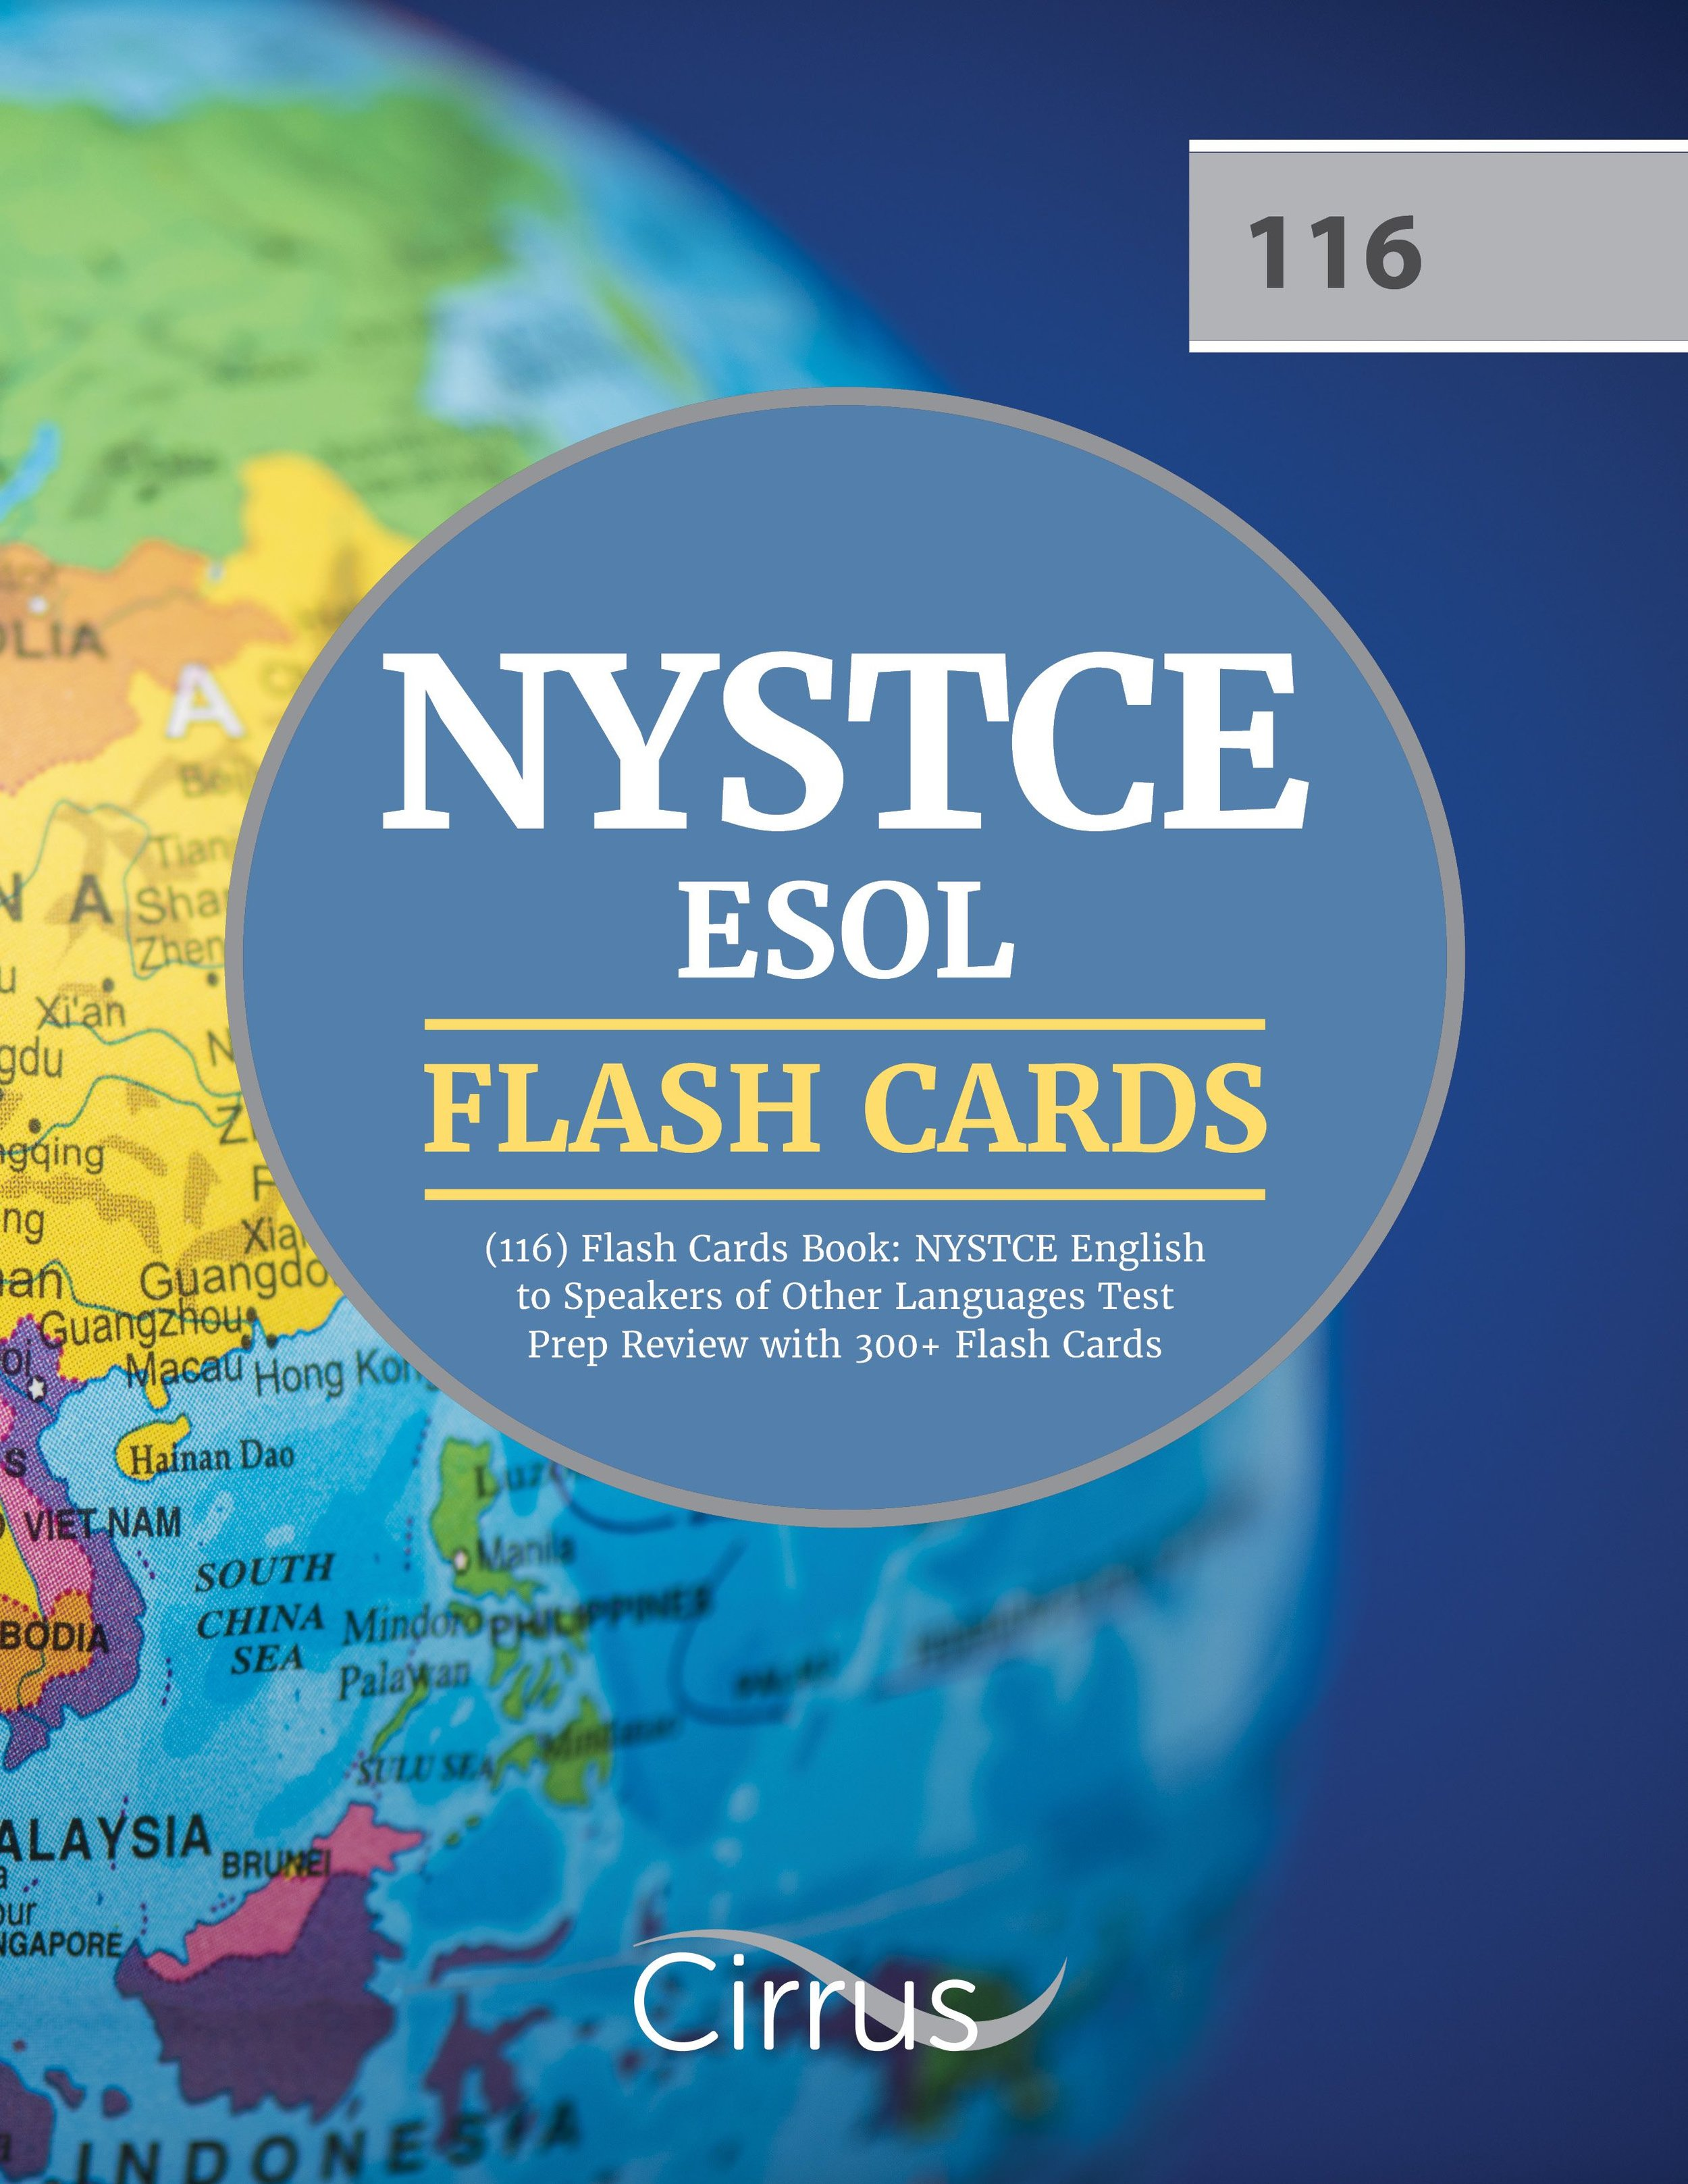 NYSTCE_ESOL_FC_cover_website-compressor.jpg